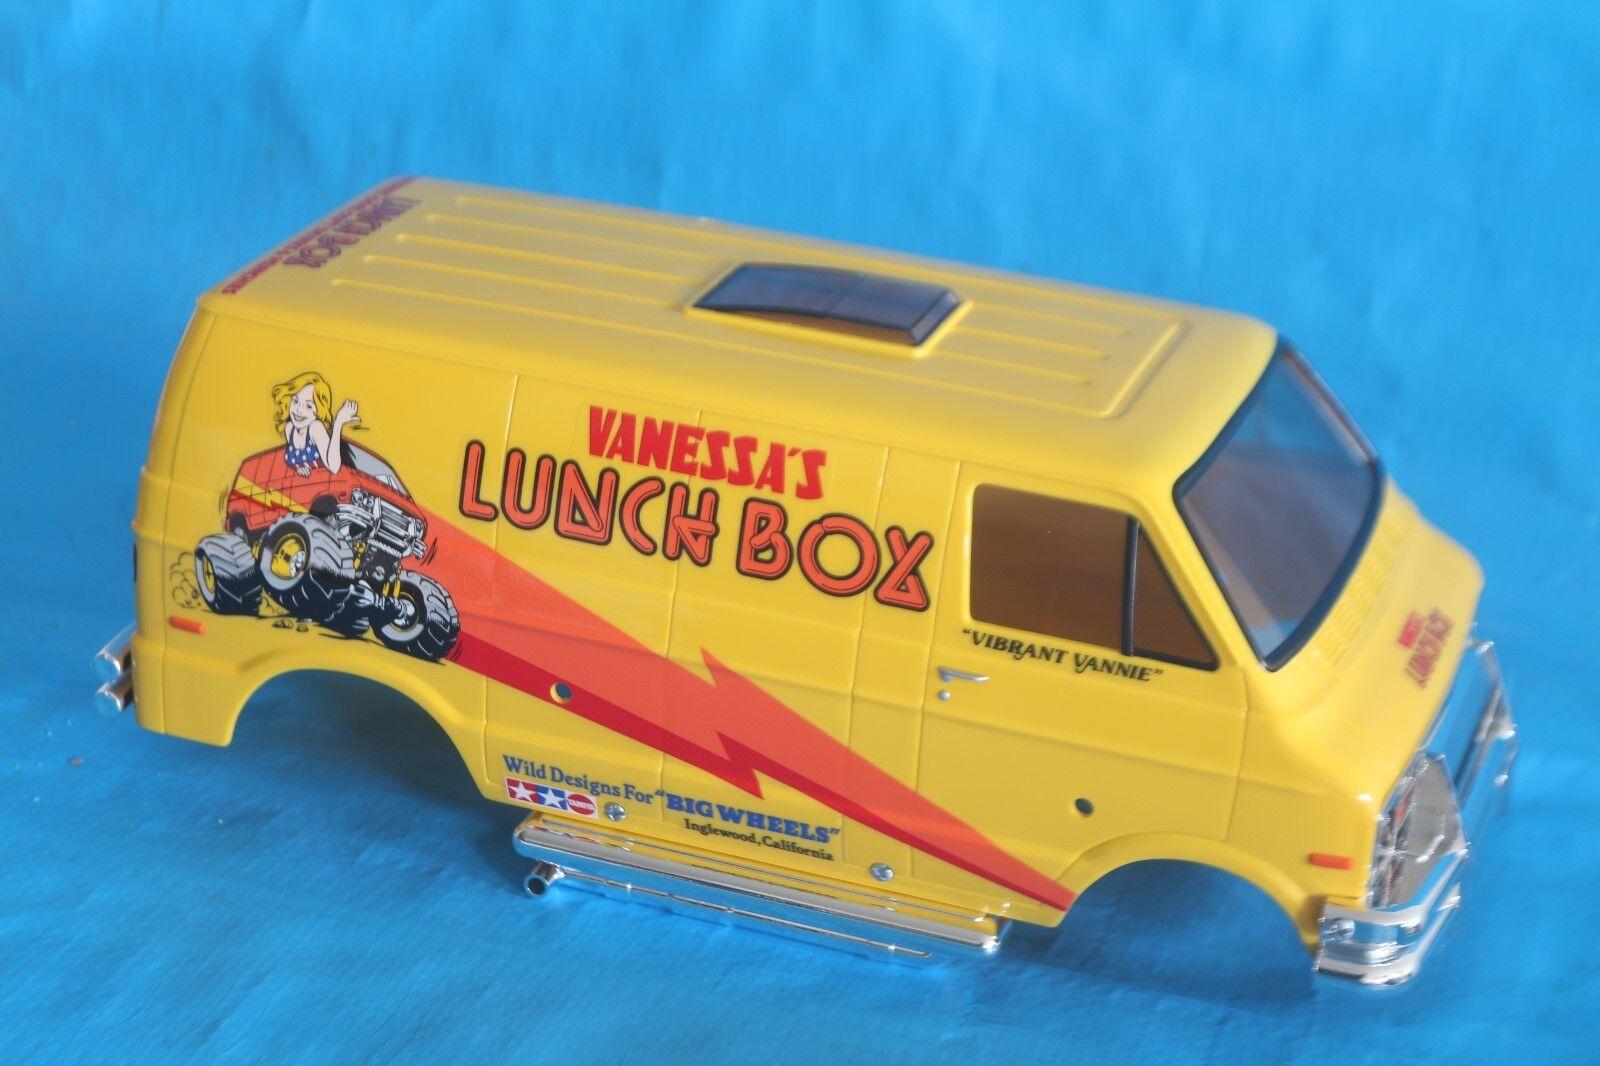 Brand New Tamiya Lunchbox Body XB Factory built 1 10 RC Vintage